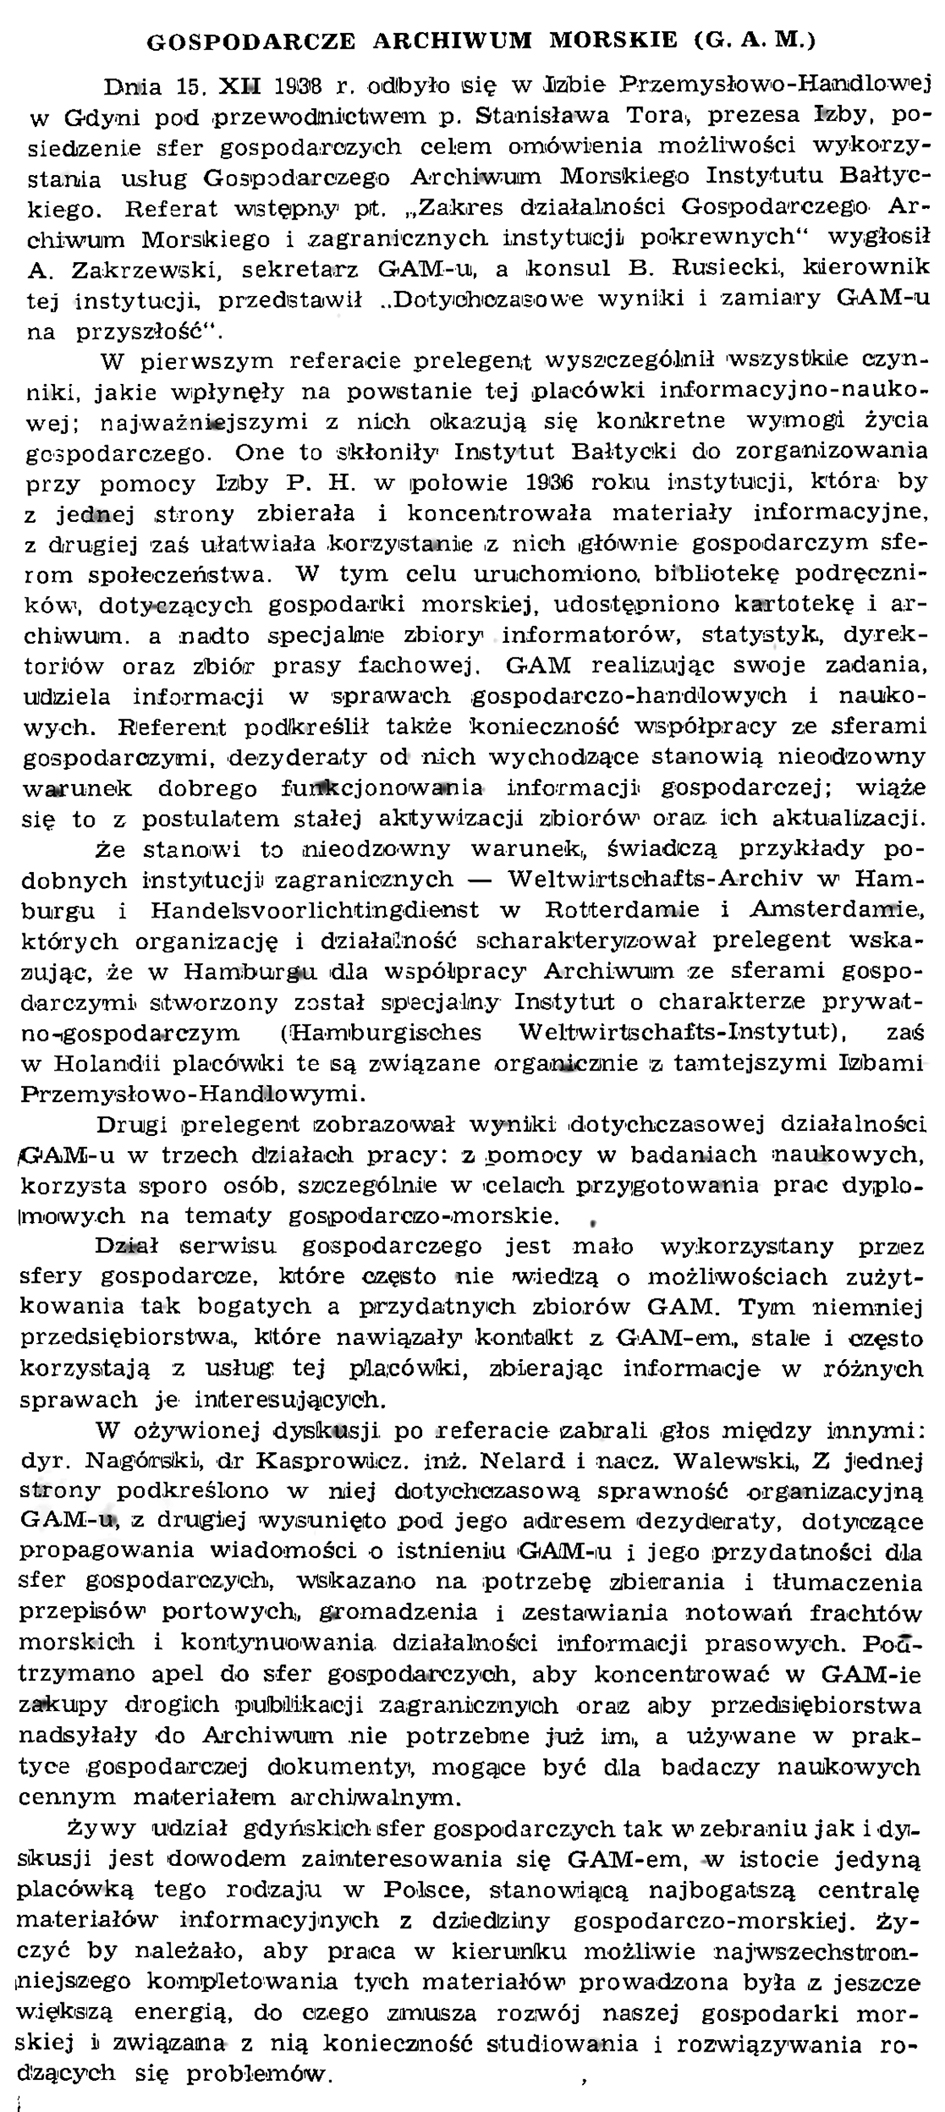 Gospodarcze Archiwum Morskie (G. A. M.)